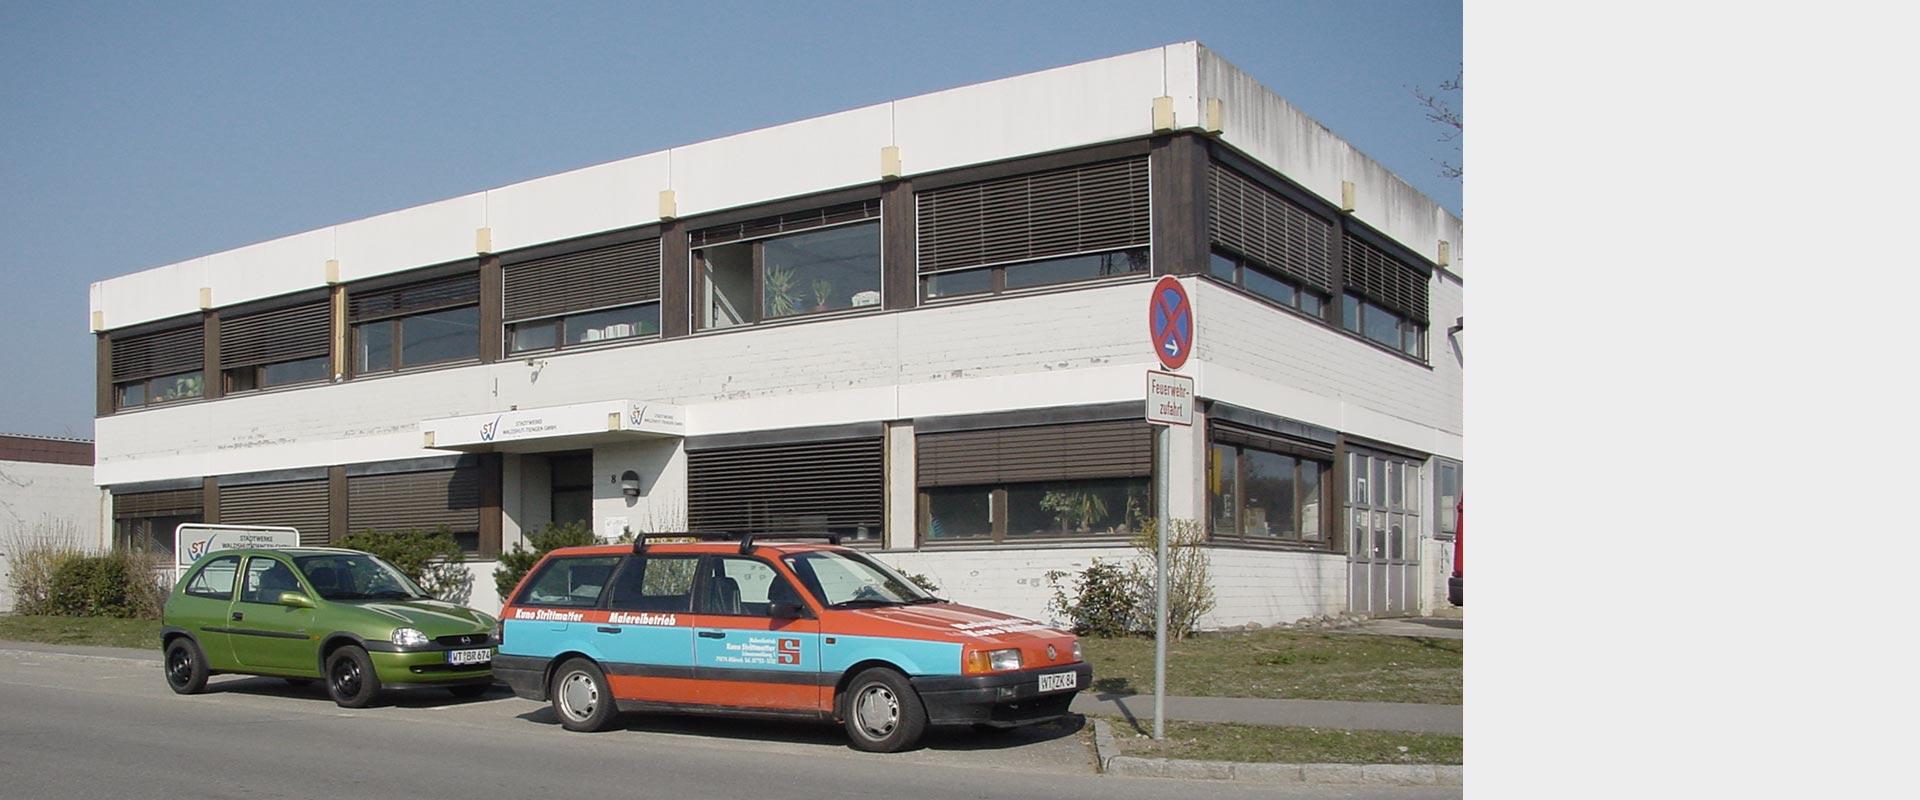 Architekturbuero_Henning_Musahl_stadtwerke11